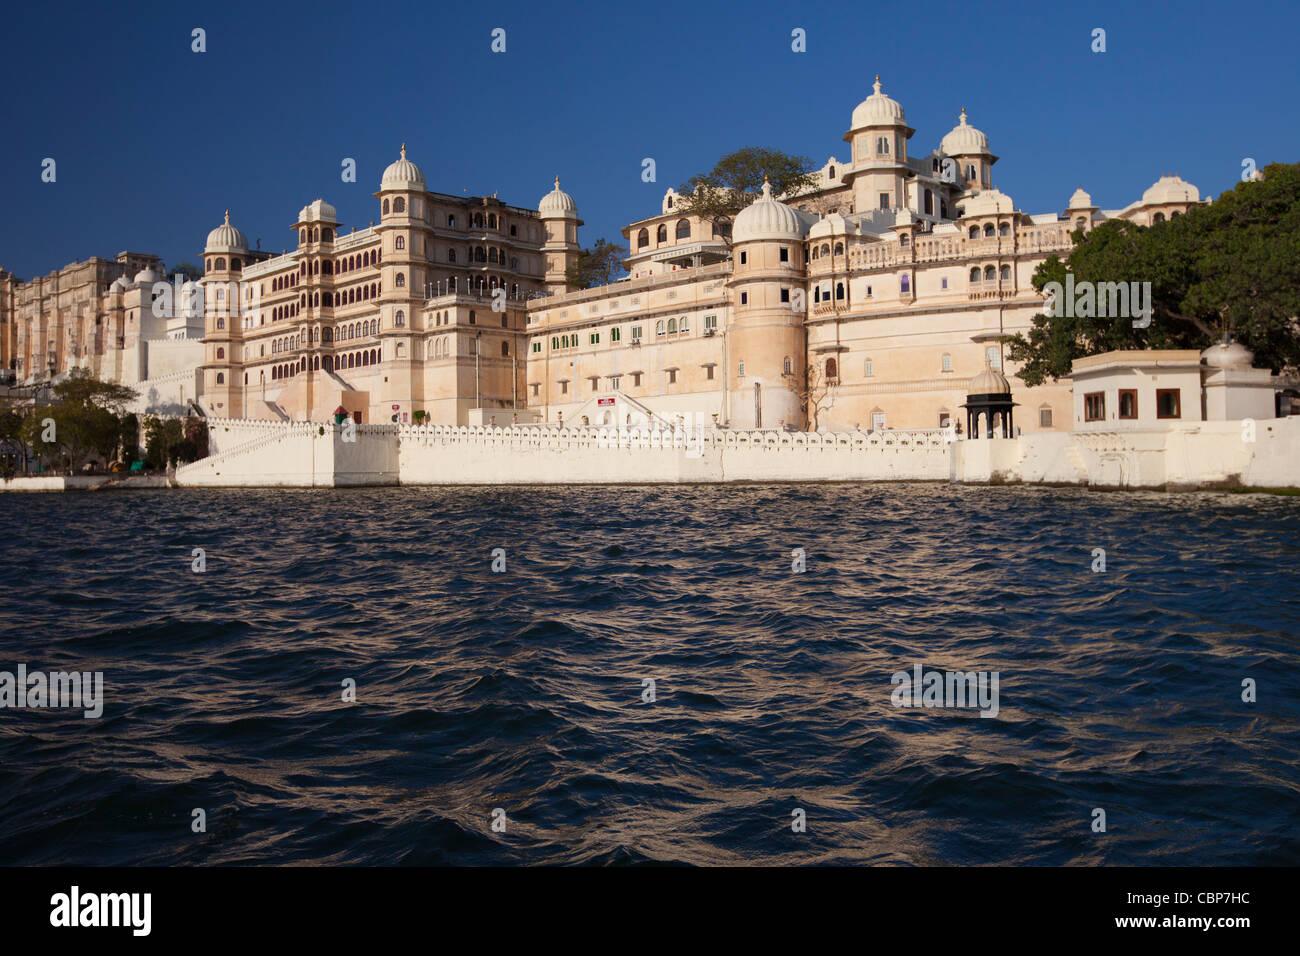 City Palace Complex and Shiv Niwas Palace Hotel of 76th Maharana of Mewar, Shreeji Arvind Singh Mewar of Udaipur - Stock Image